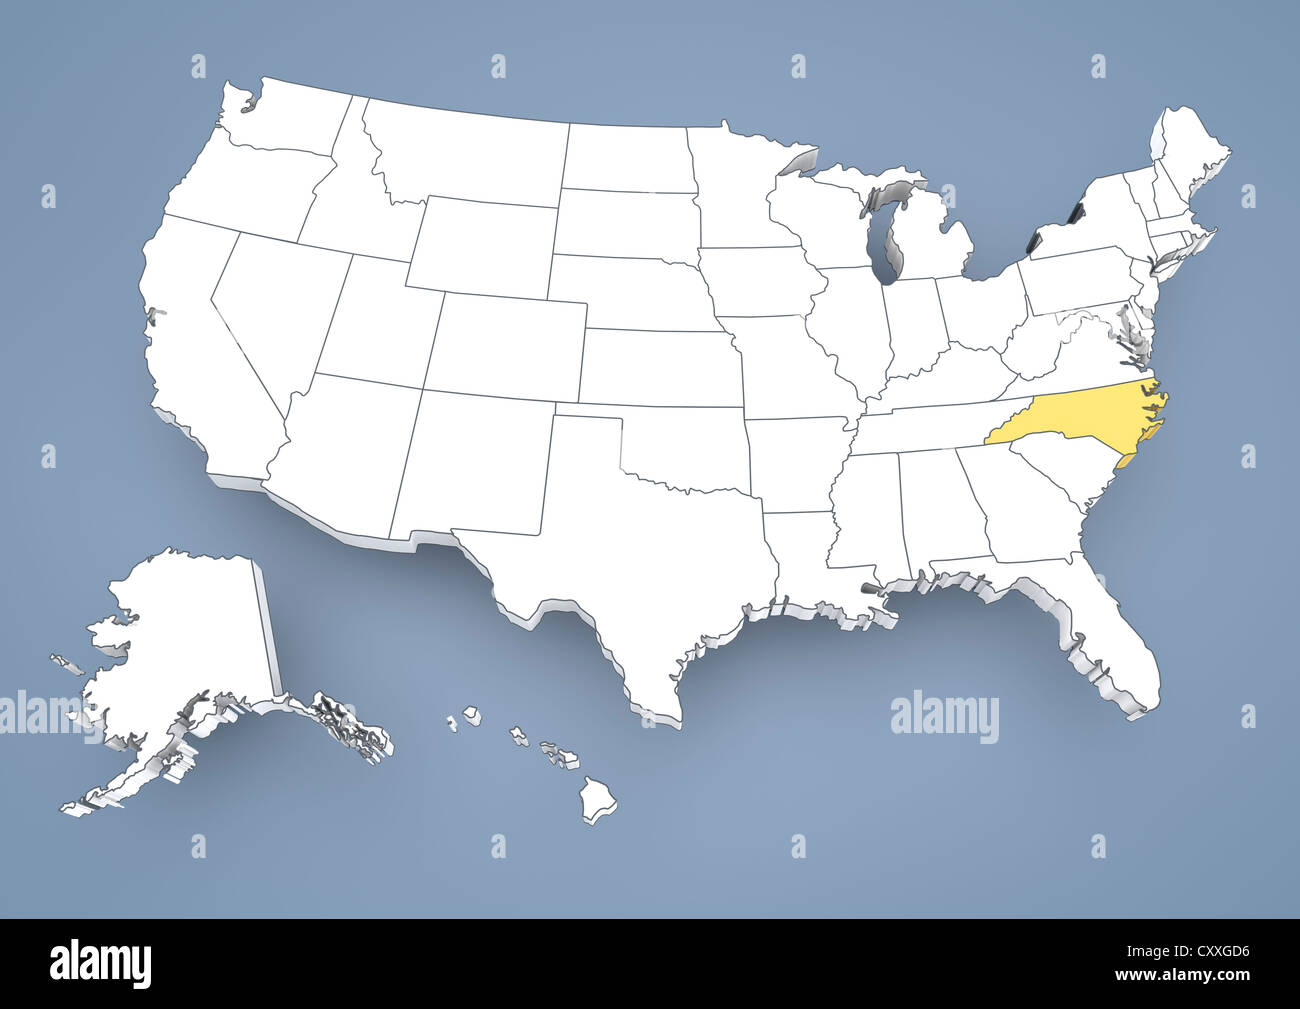 United States Map North Carolina.North Carolina Nc Highlighted On A Contour Map Of Usa United